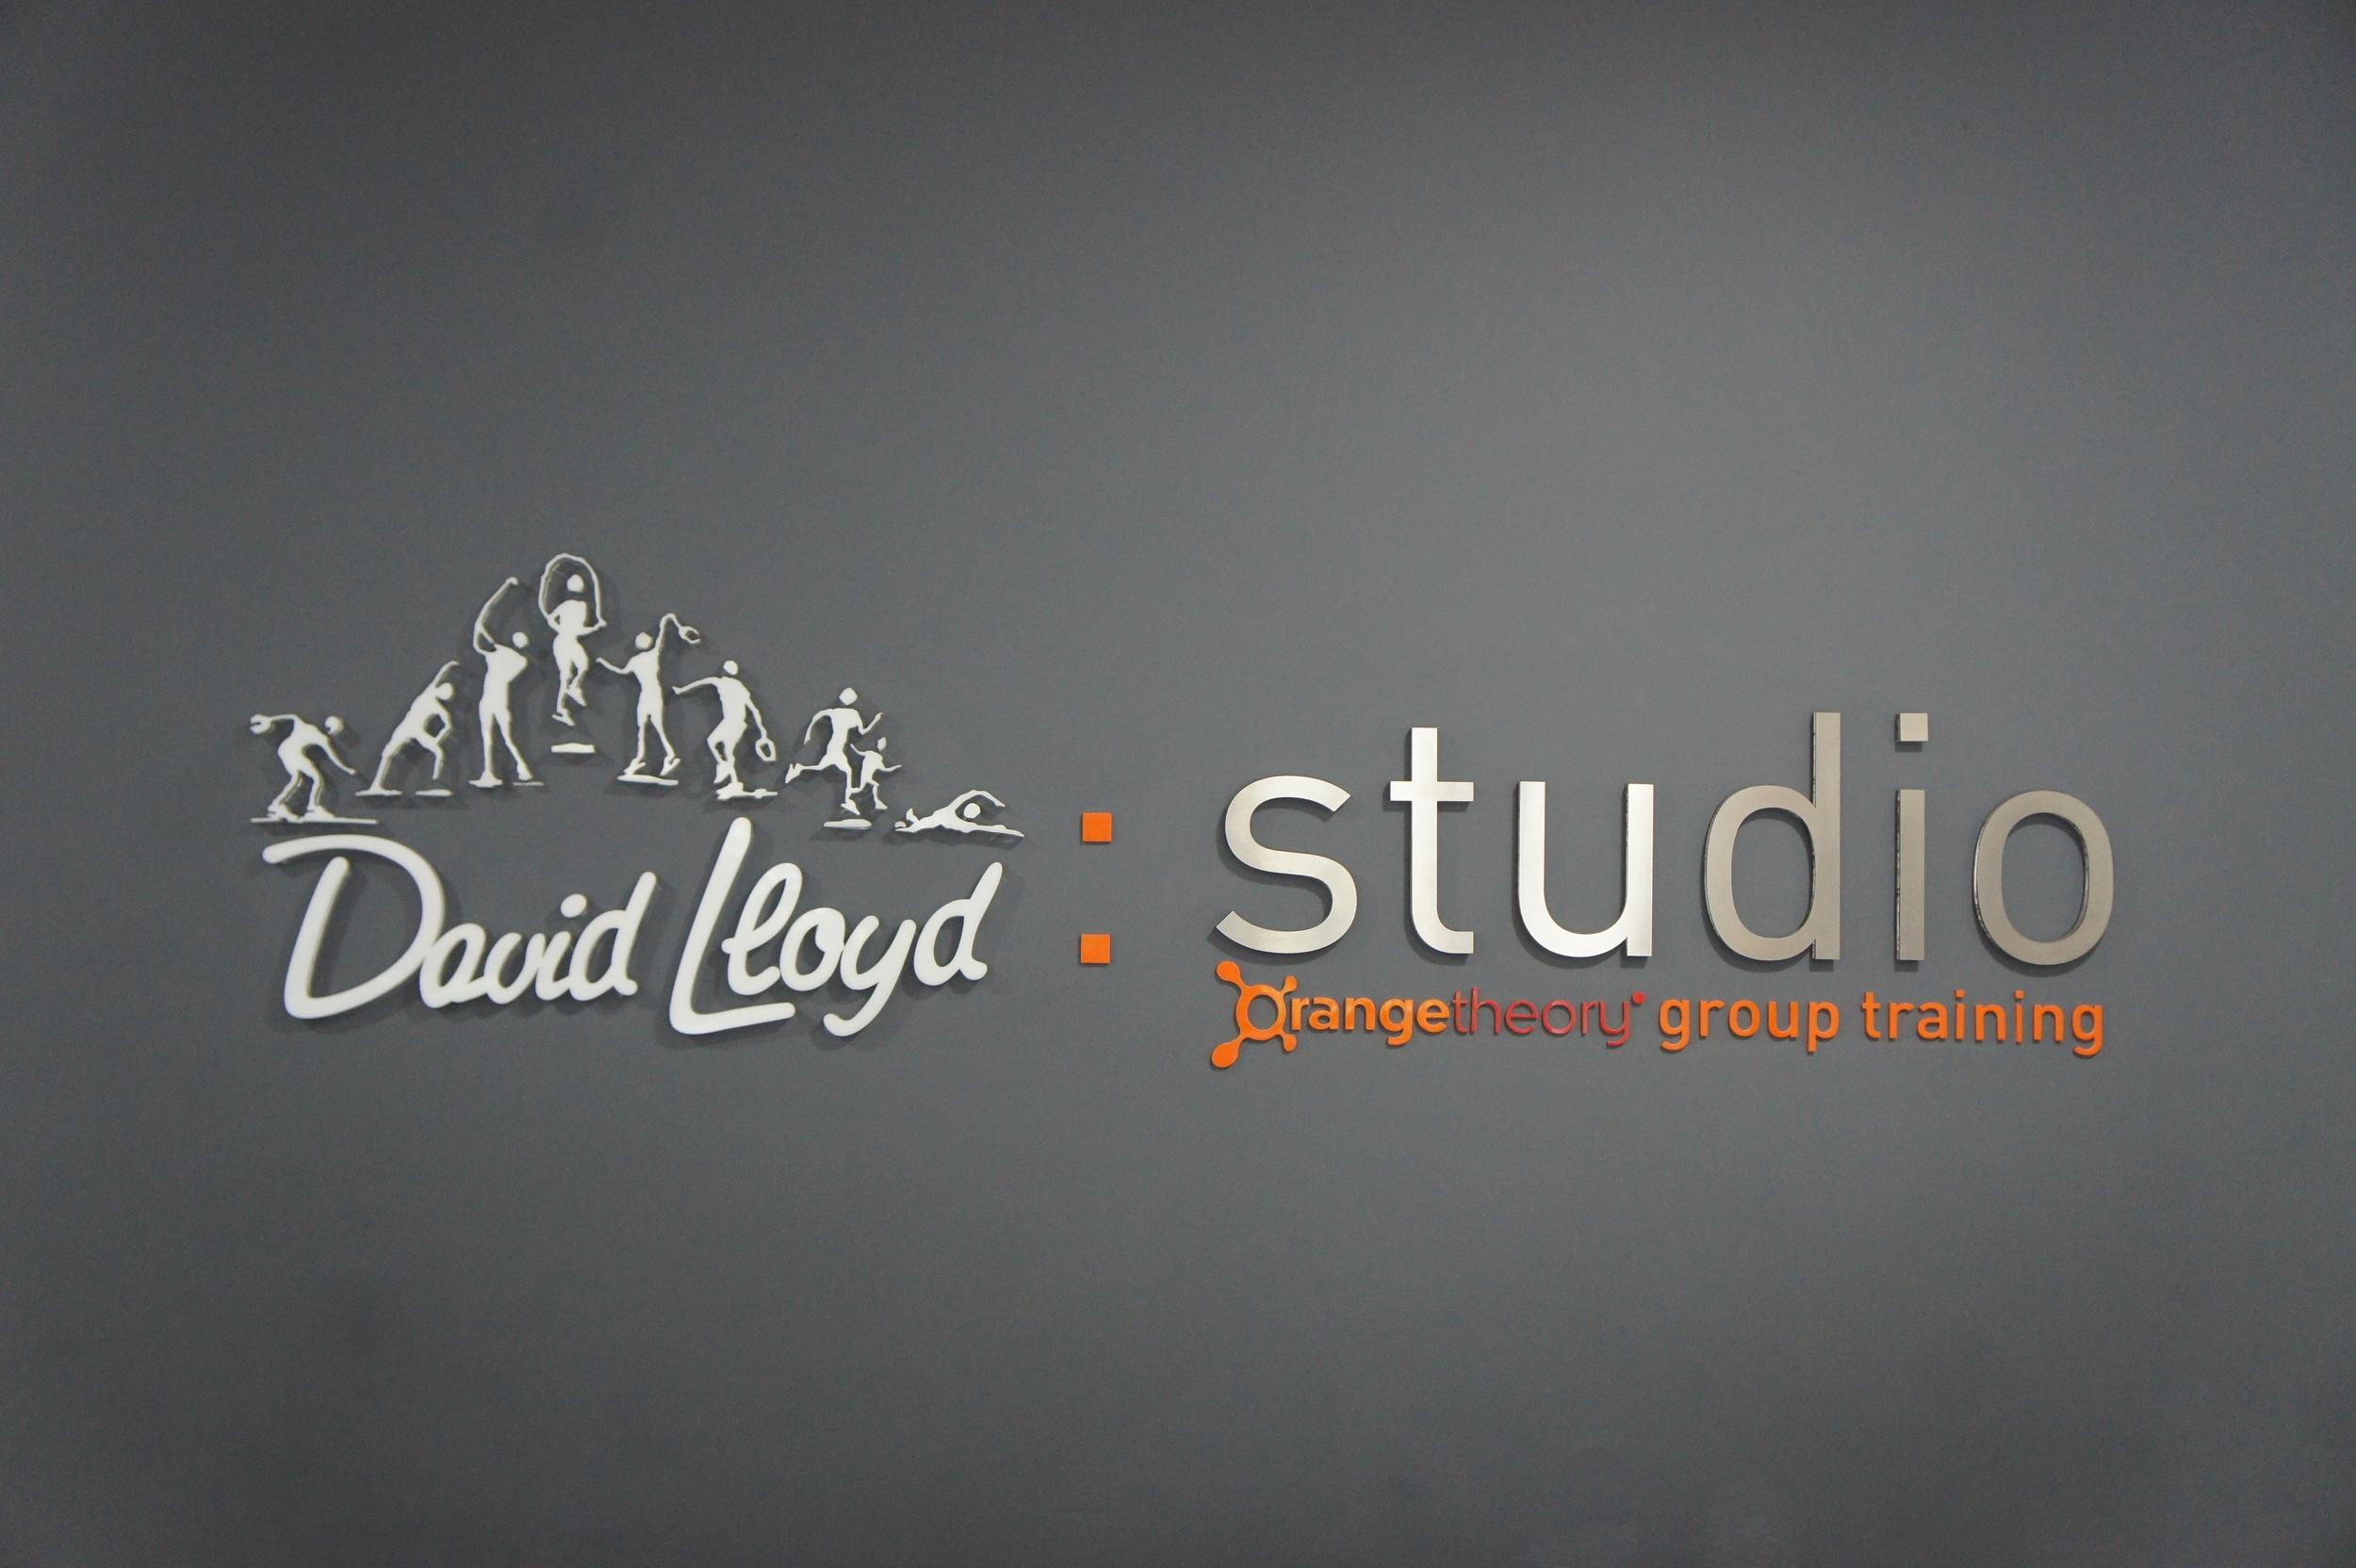 David-Lloyd-Orangetheory-Studio